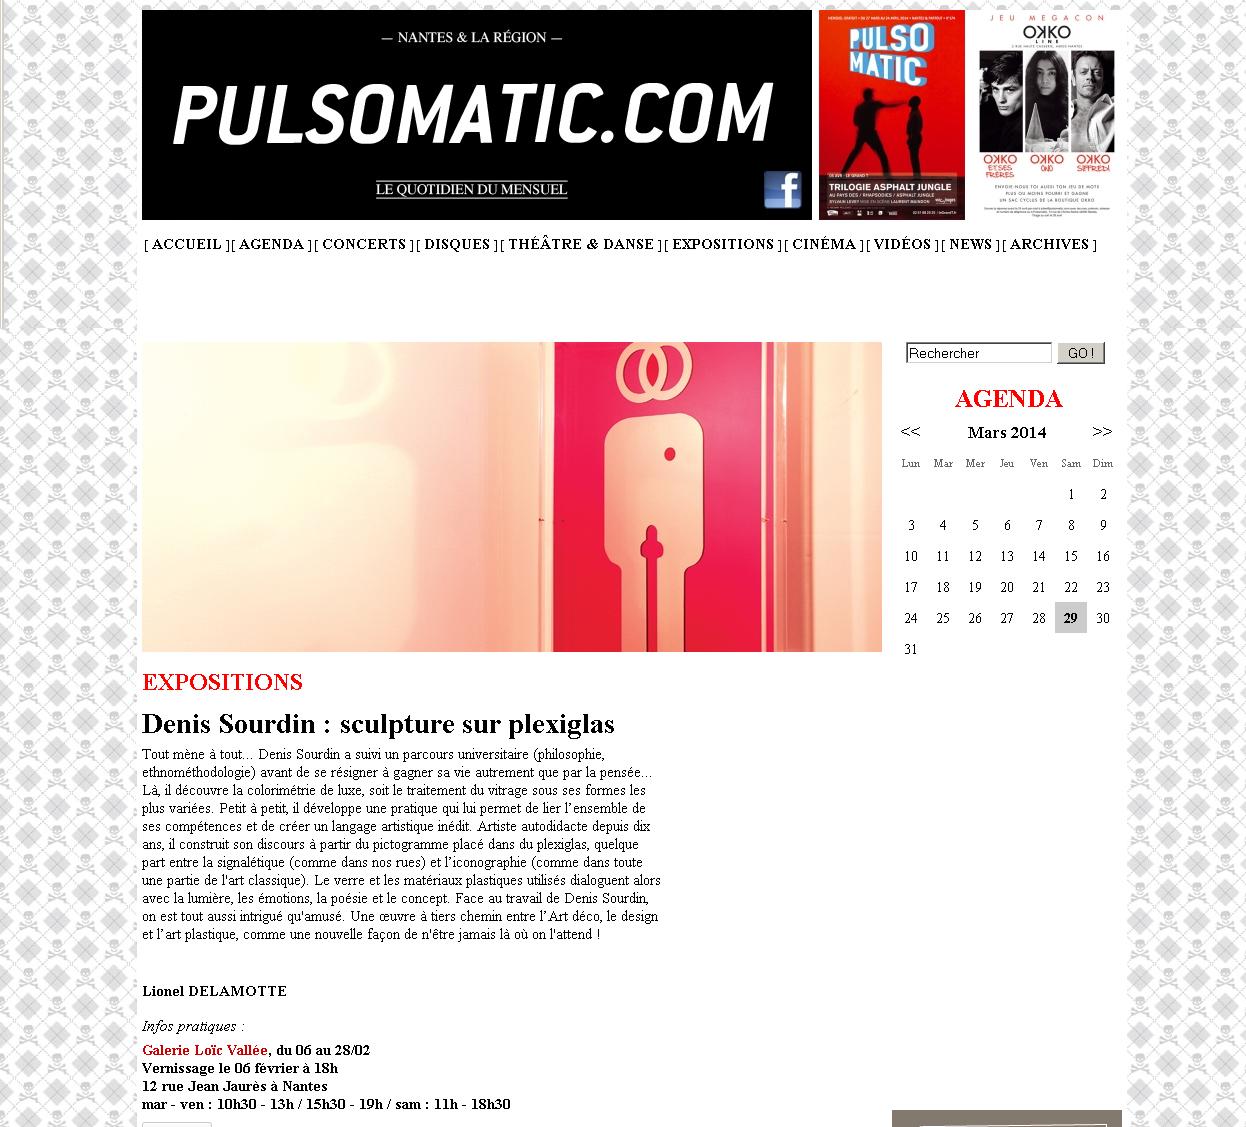 ARTICLE PULSO D SOURDIN 2014